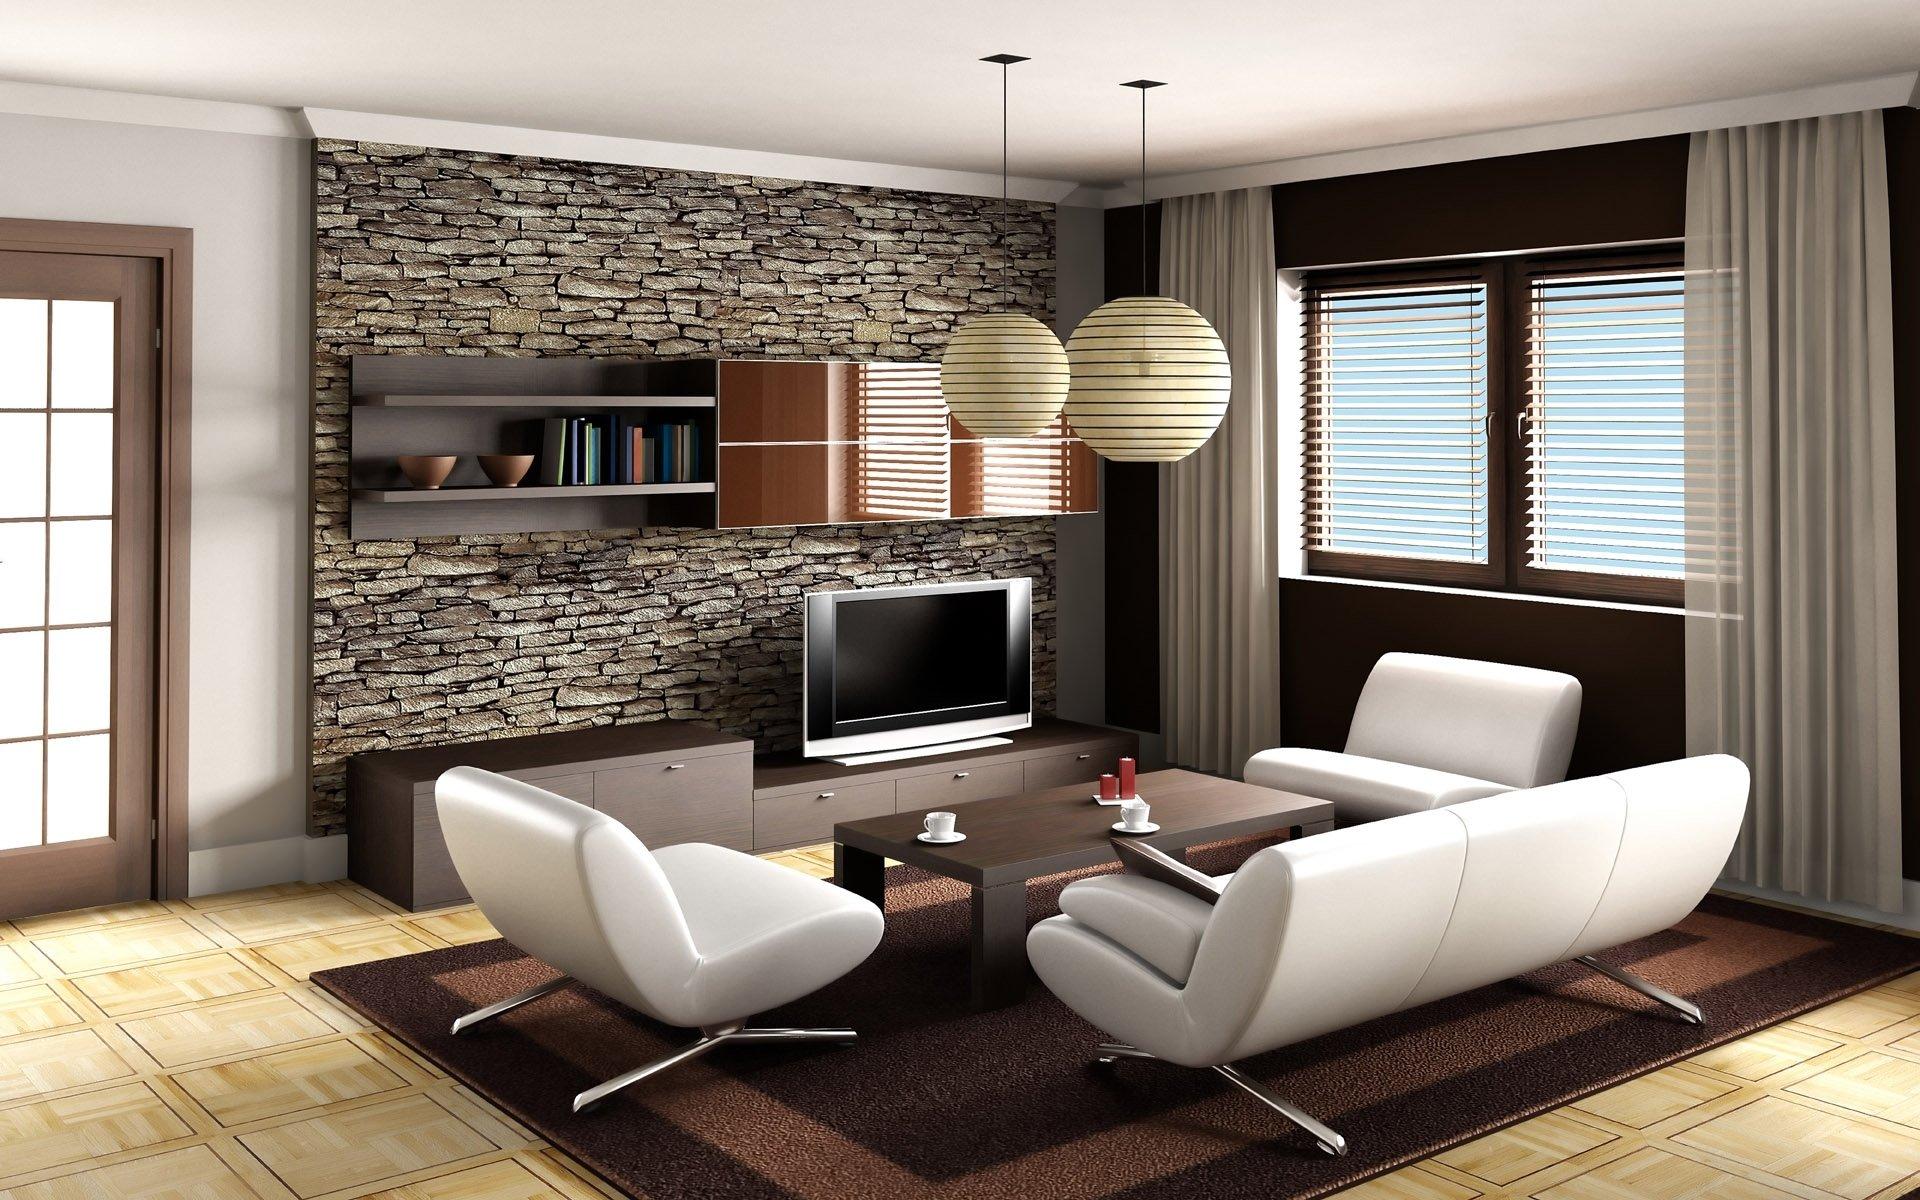 10 Pretty Ideas For A Living Room living room furniture living room decoration ideas living room 1